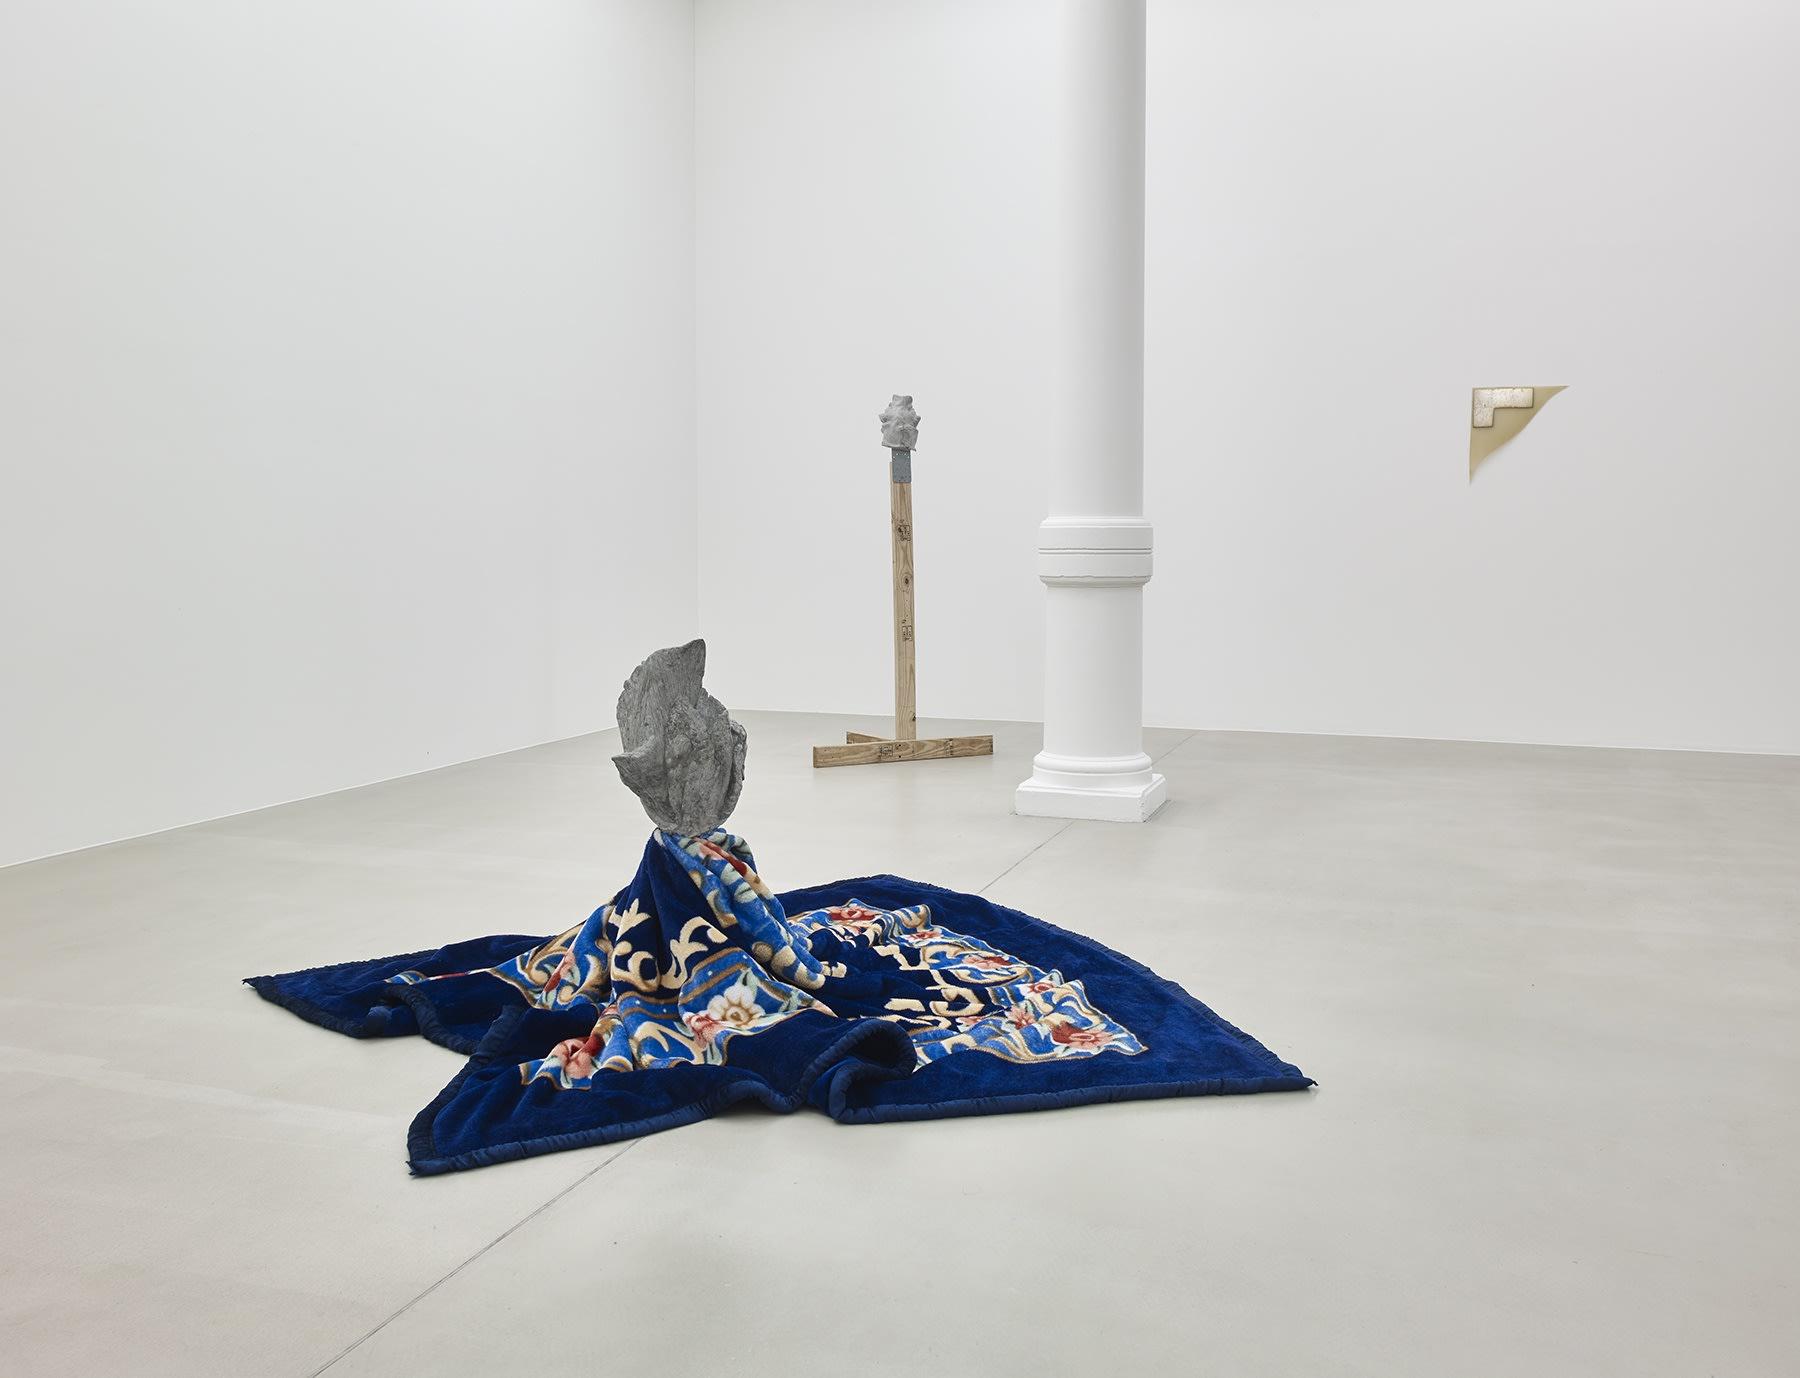 Sculpture 4tet Luciano Fabro, Jean-Luc Moulène, Bruce Nauman & Danh Vo - curated by Jean-Pierre Criqui